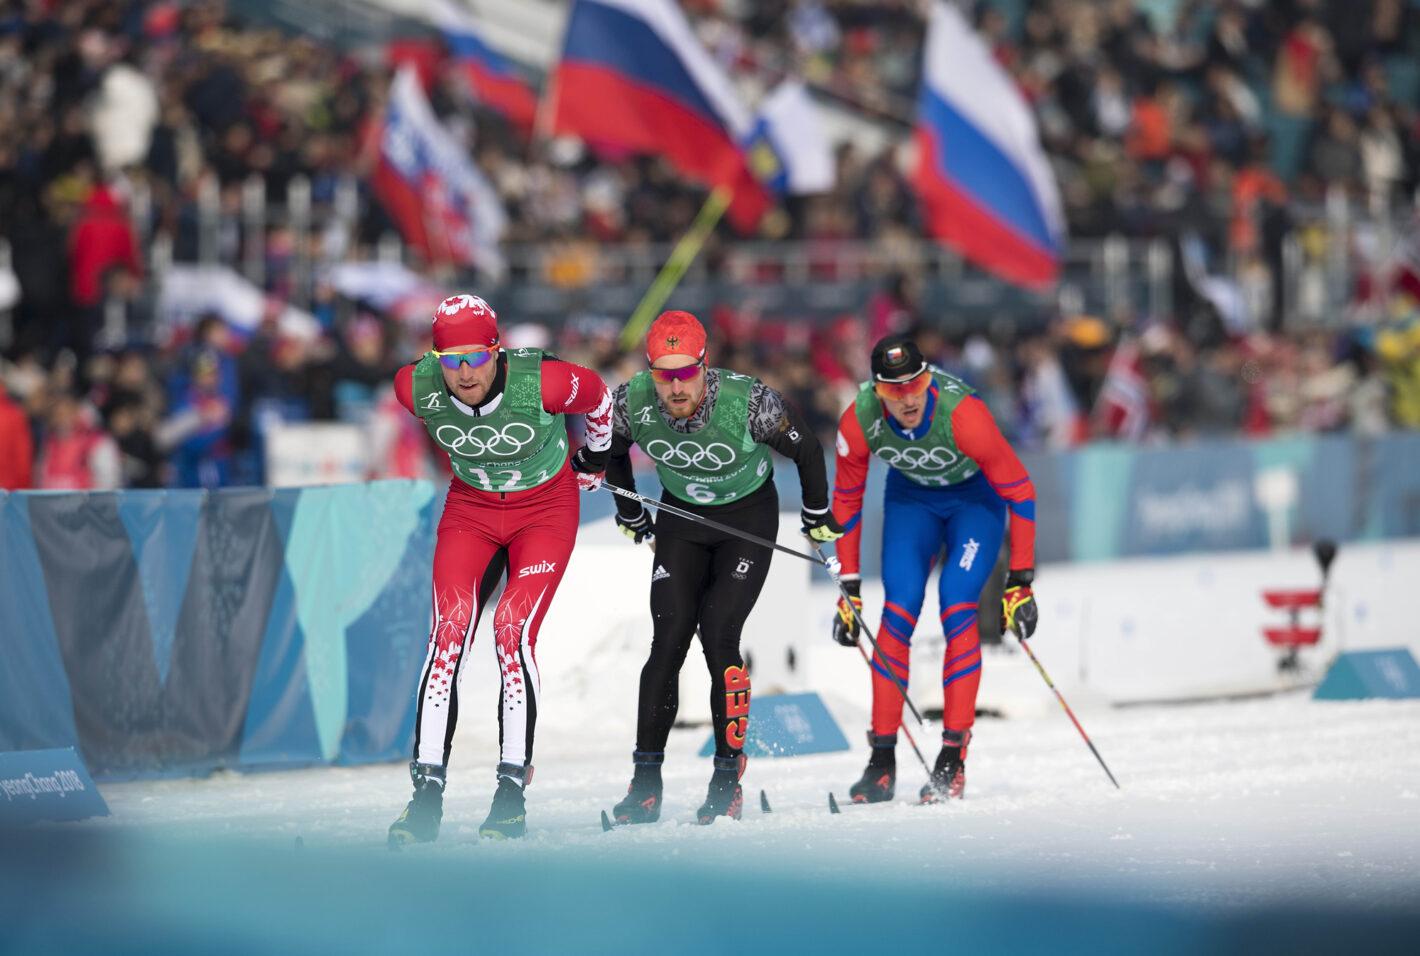 From left, Algo Karp (EST), Thomas Bing (GER), Martin Jaks (CZE) in action, Cross-Country Skiing, Men's 4 x 10km Relay, Alpensia Cross-Country Skiing Centre on February 12, 2018 during the PyeongChang 2018 Winter Olympic Games. Nikon D5 | AF-S NIKKOR 400mm f/2.8E FL VR | ISO 100 | 1/2000 s | f/5.0 Photo by Anke Wälischmiller/ FOTOAGENTUR SVEN SIMON